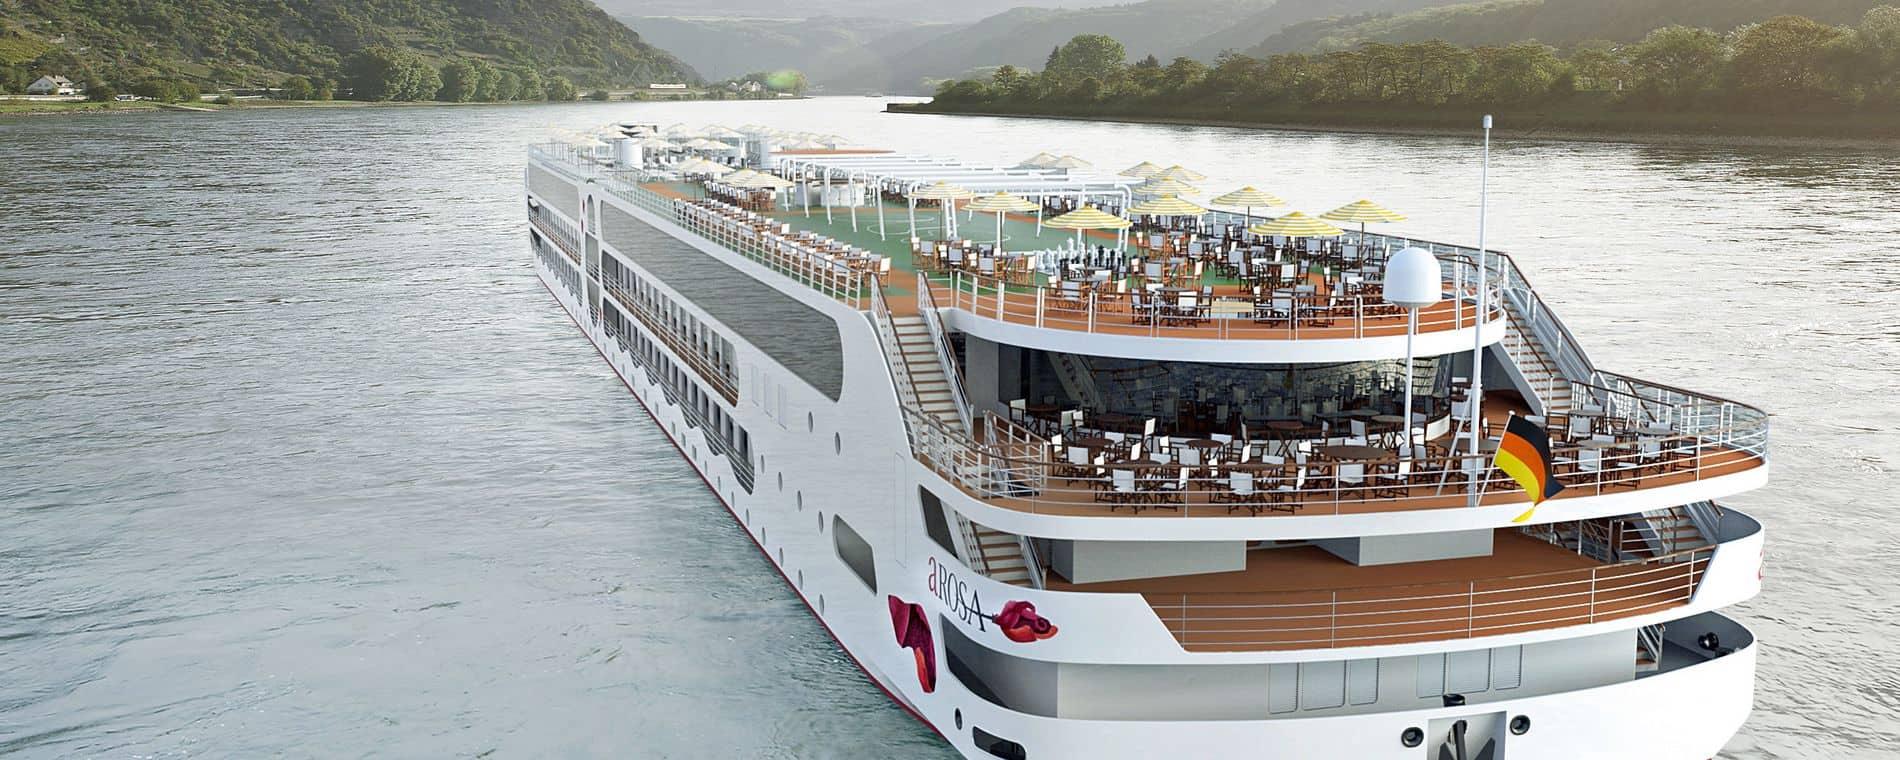 a'rosa e-motion river ship rendering